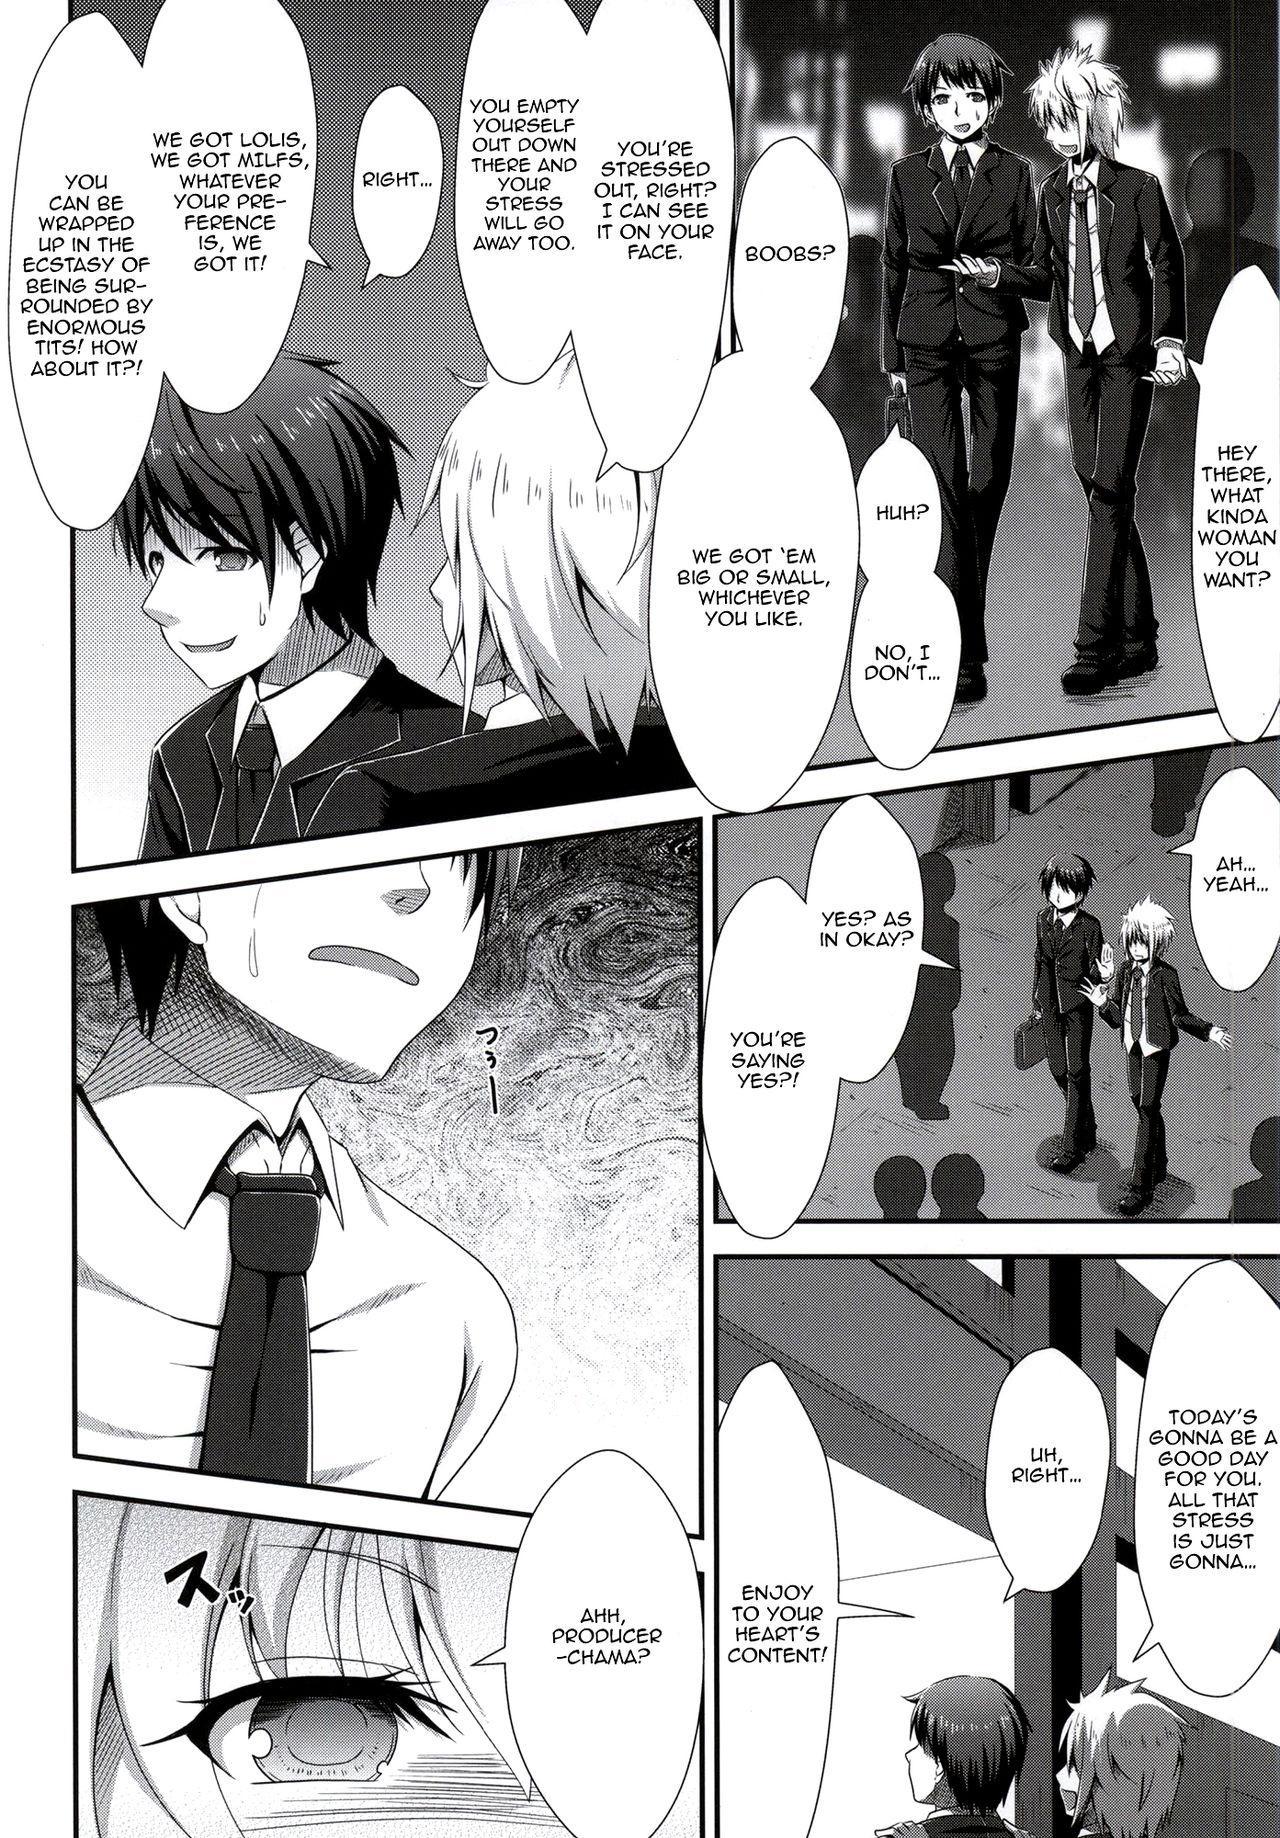 Ojou-chama no Shasei Kanri 4